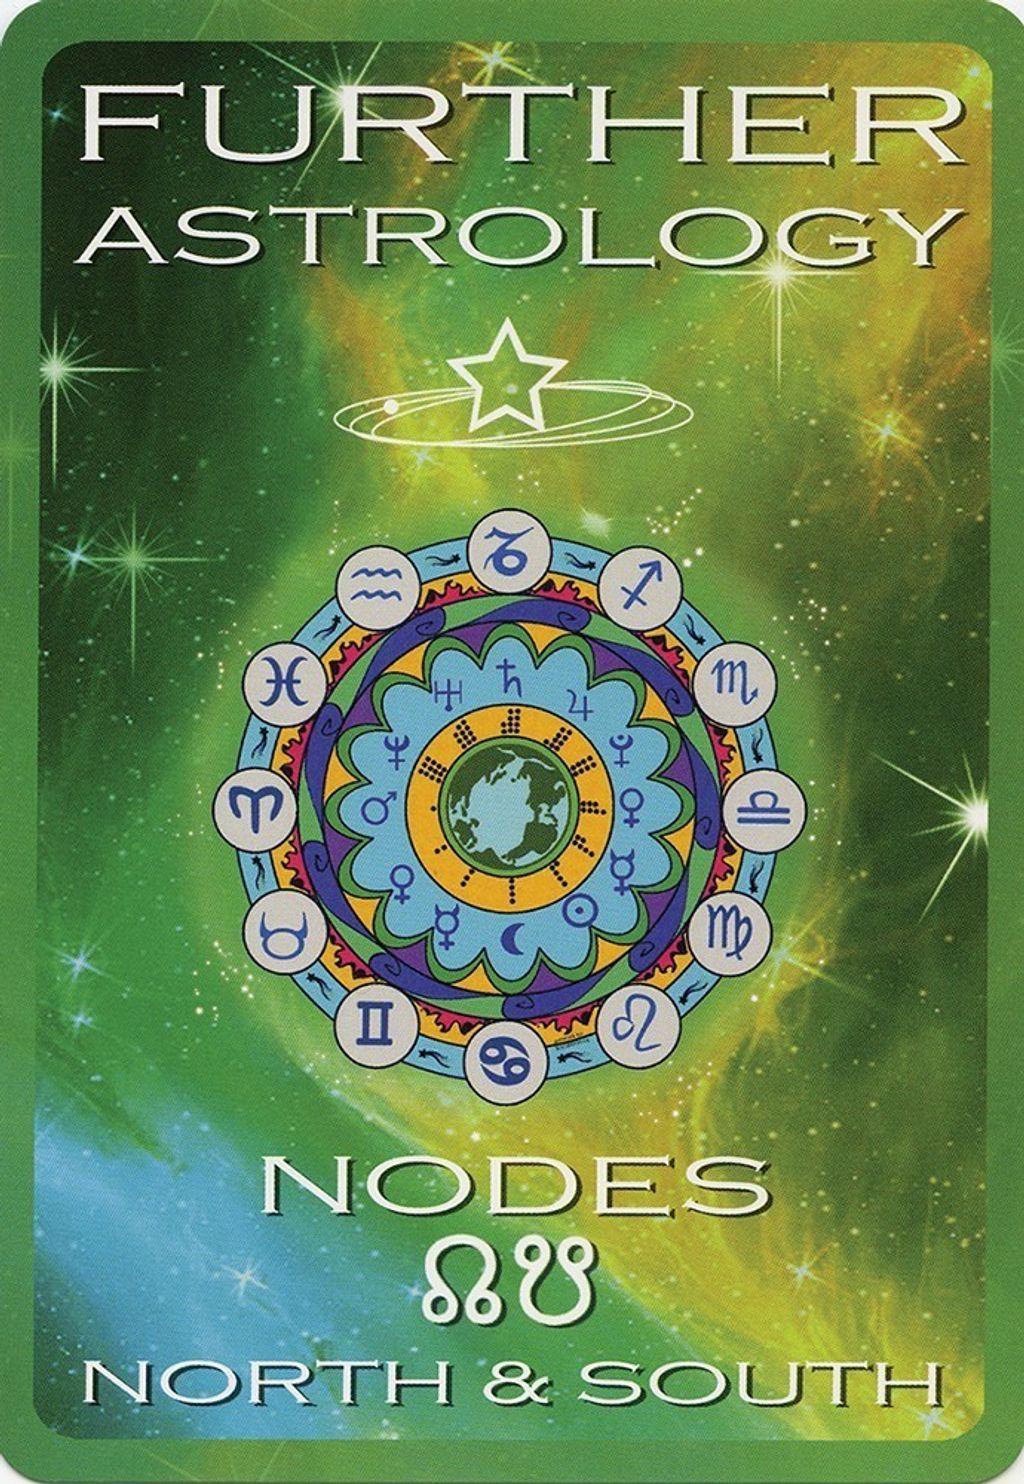 正向占星卡:Positive Astrology Cards.jpg5.jpg